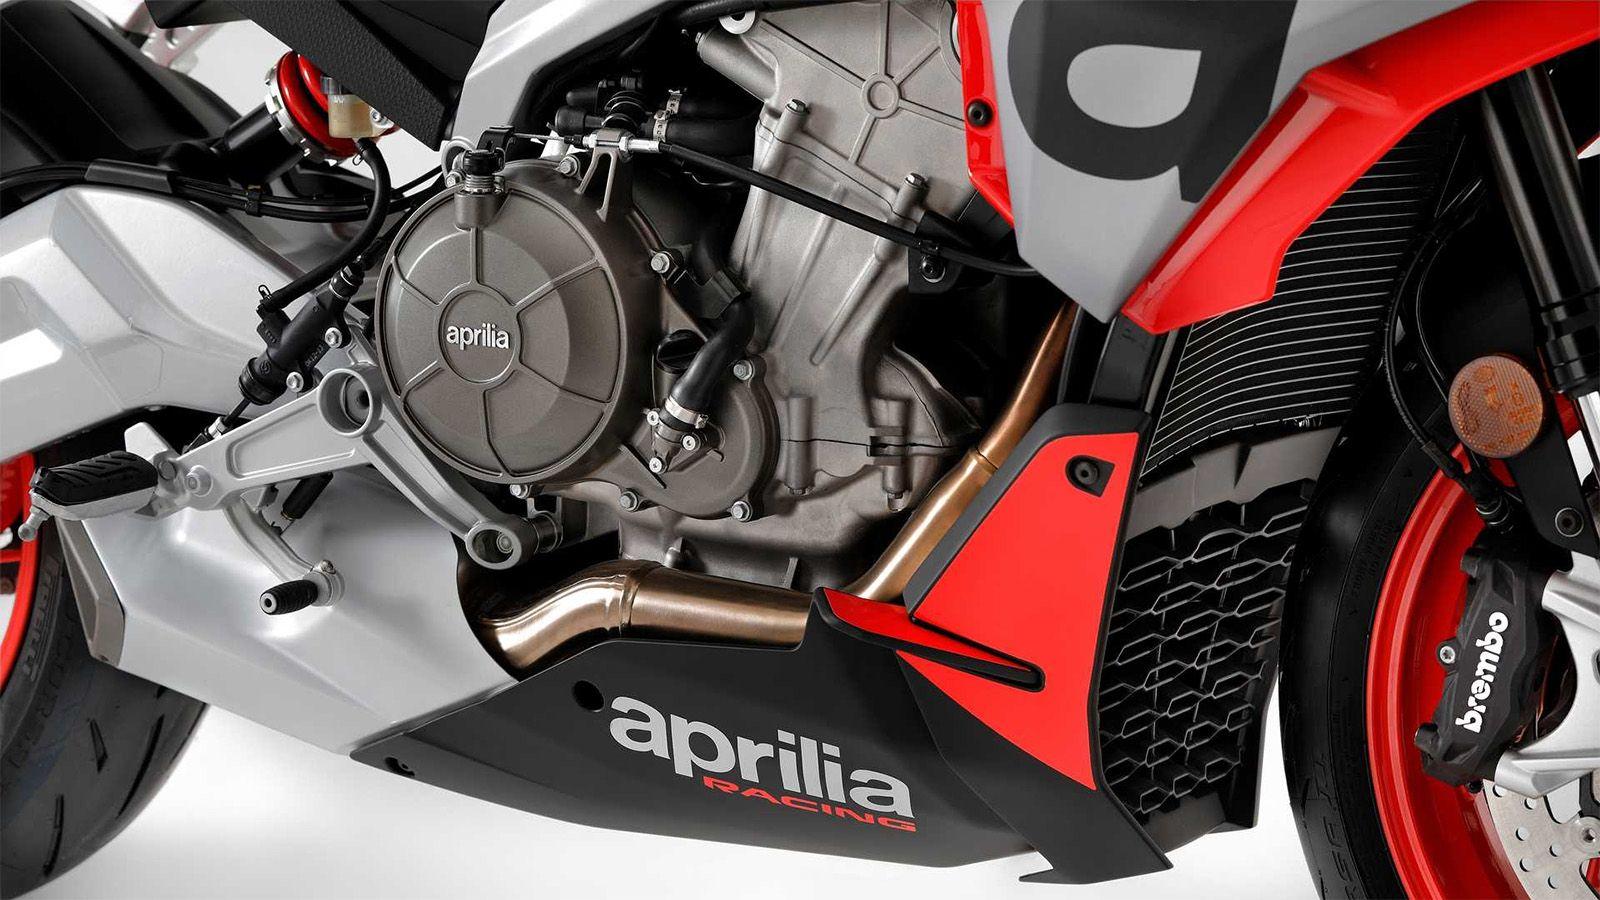 Aprilia Tuono V4X 2021: Ήρθε η επιβεβαίωση! Ειδική έκδοση